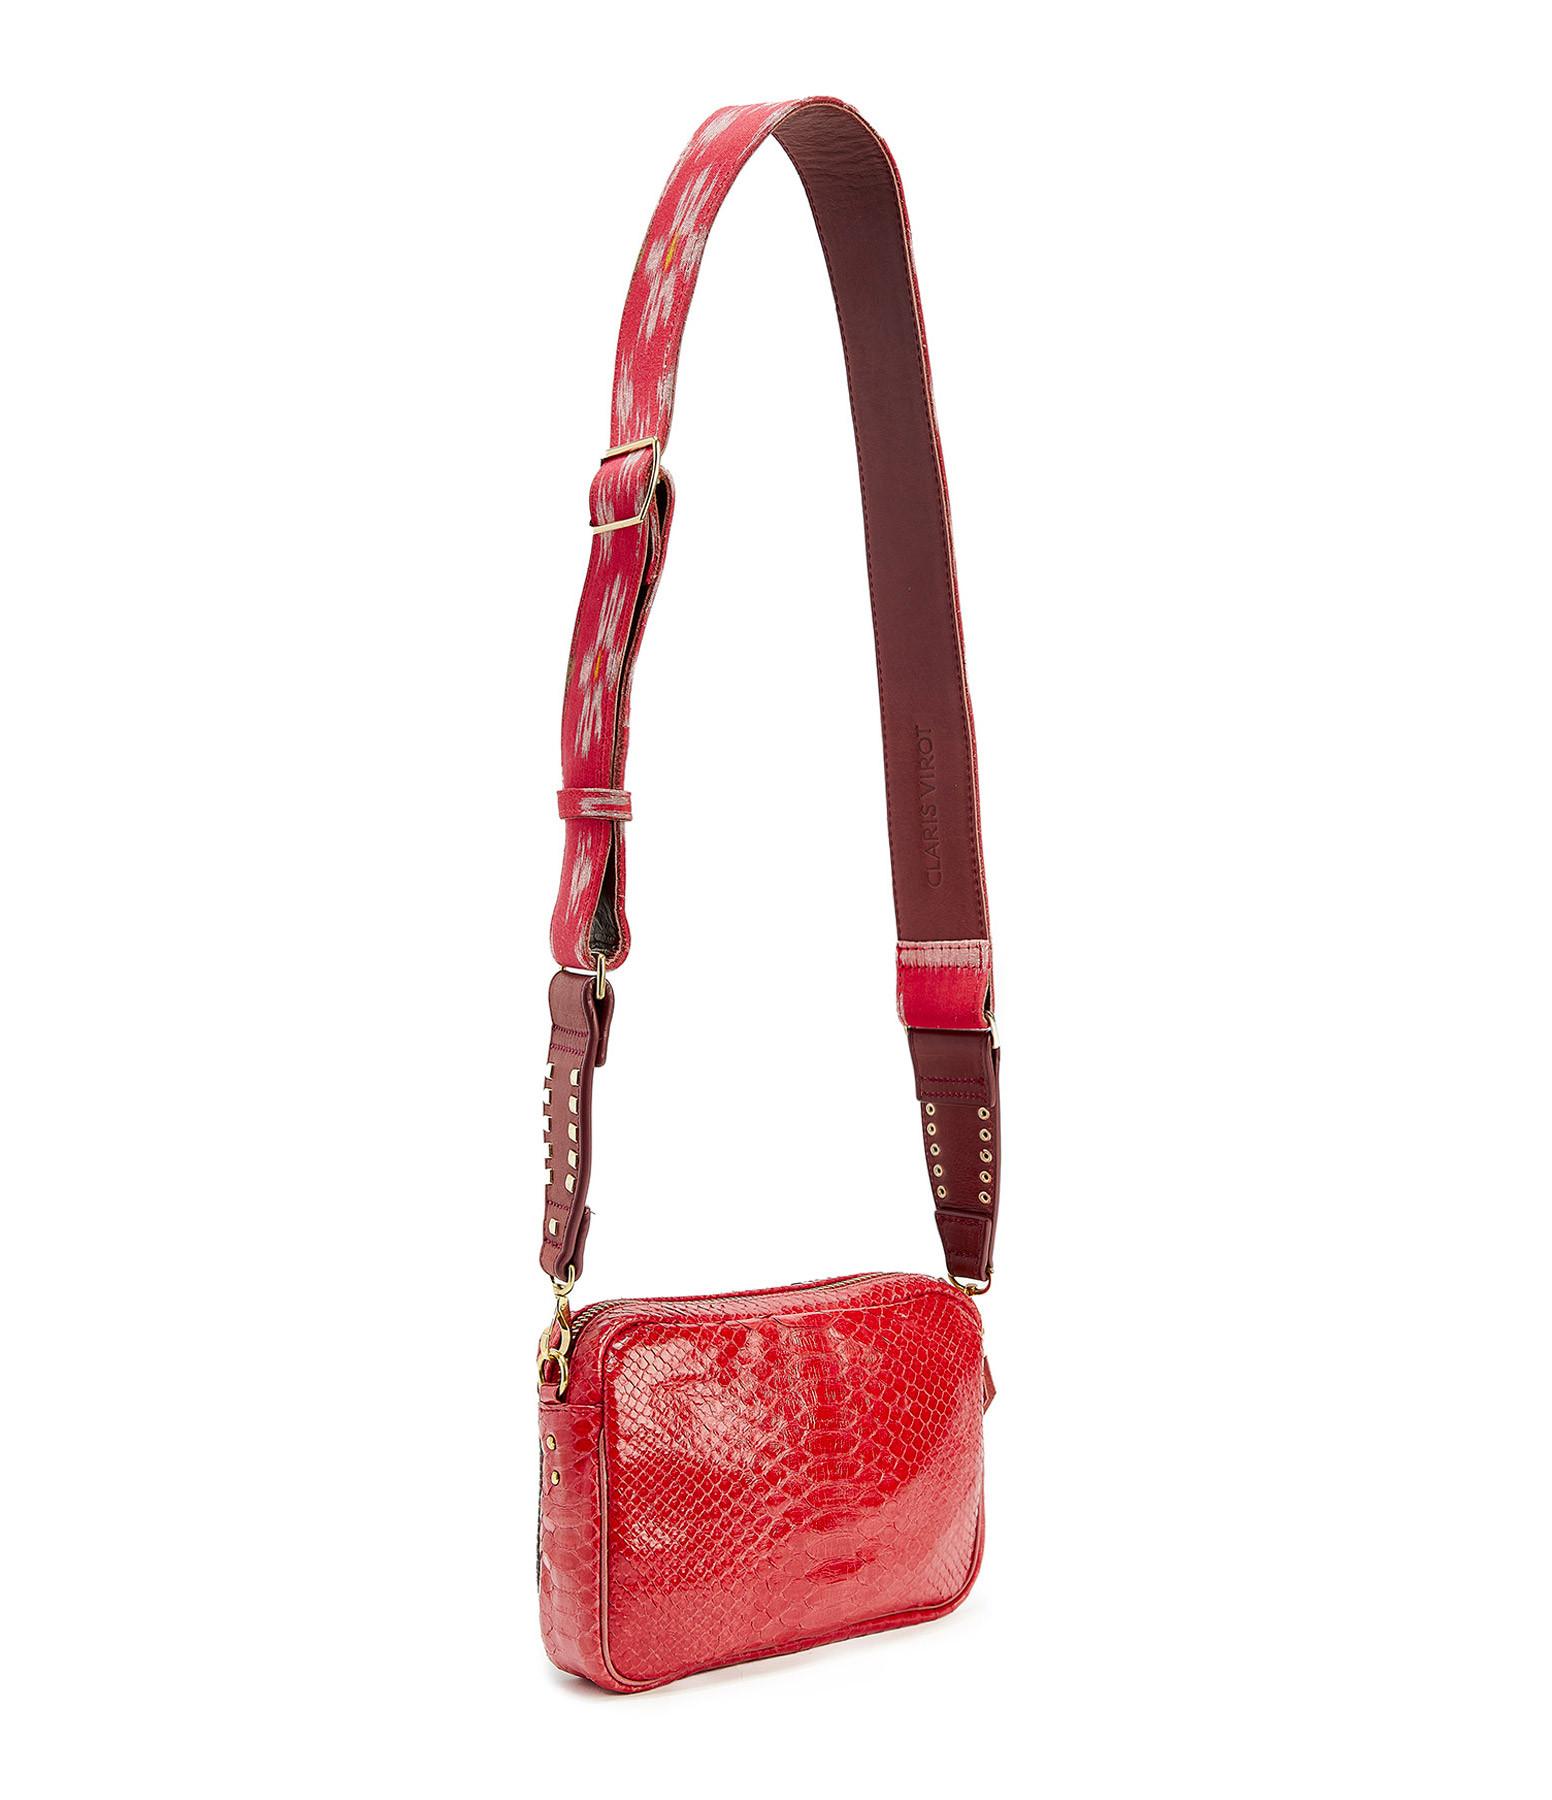 CLARIS VIROT - Sac Charly Python Bandoulière Rouge